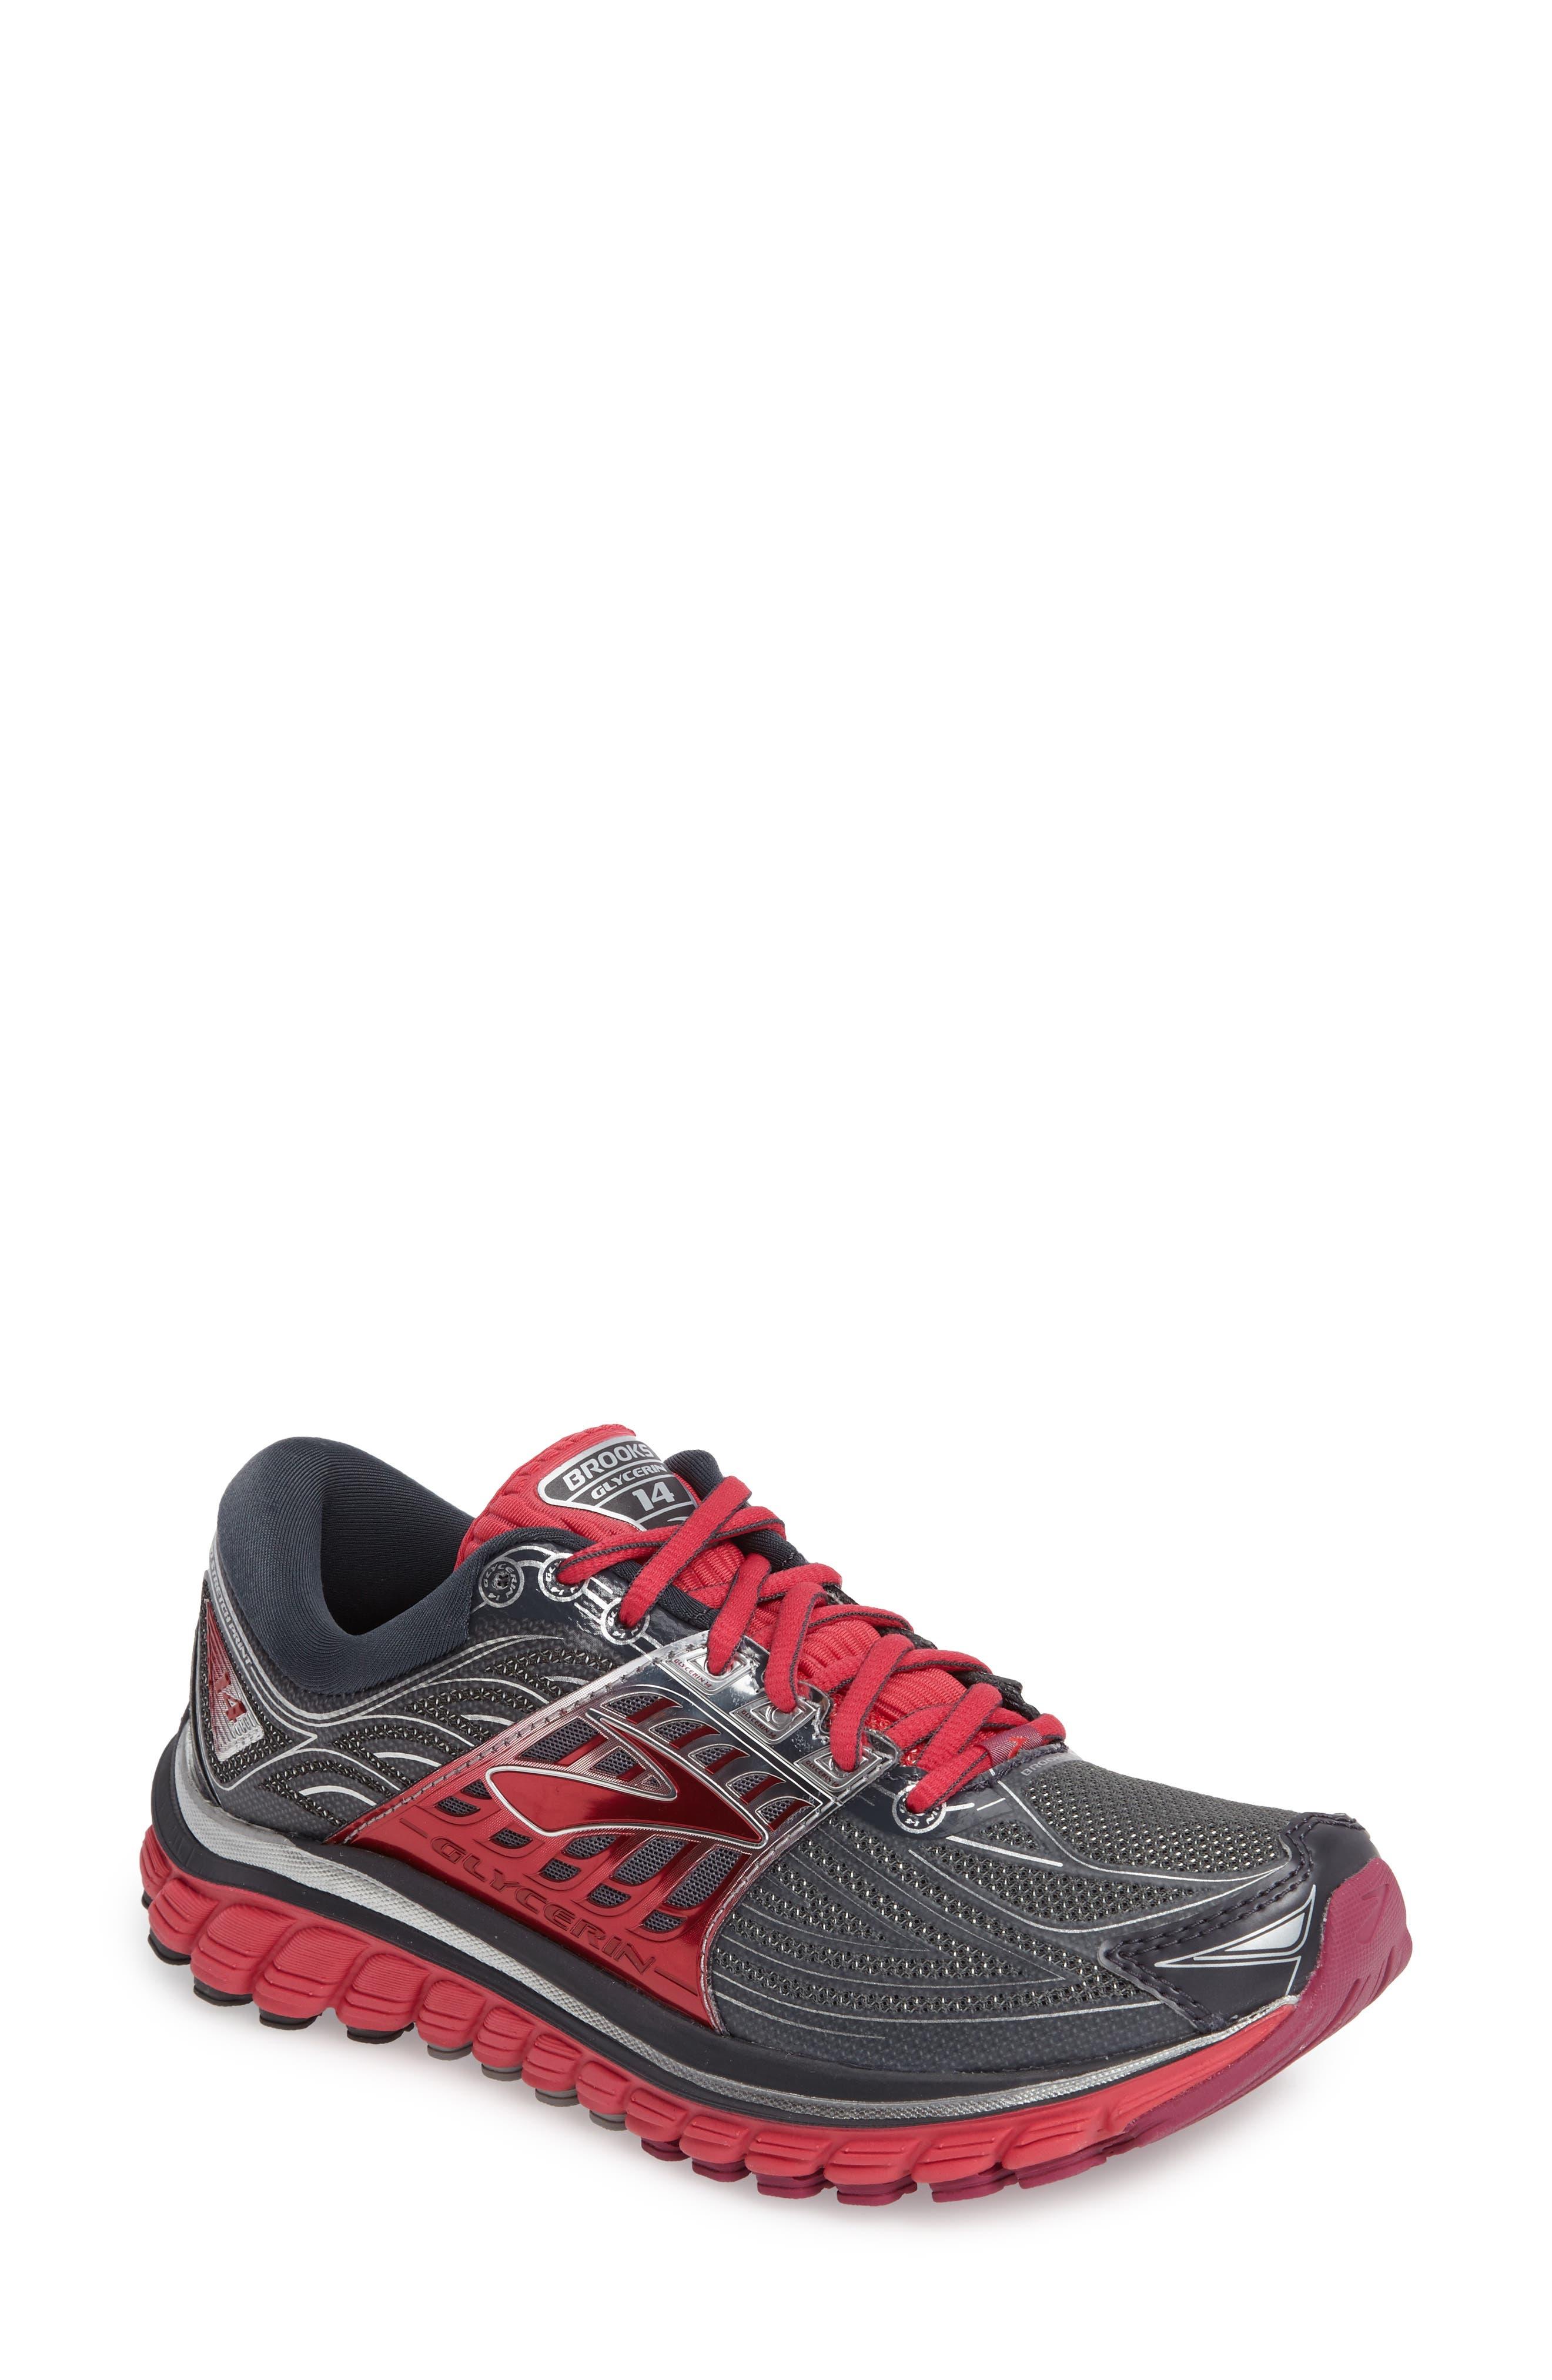 Main Image - Brooks 'Glycerin 14' Running Shoe (Women)